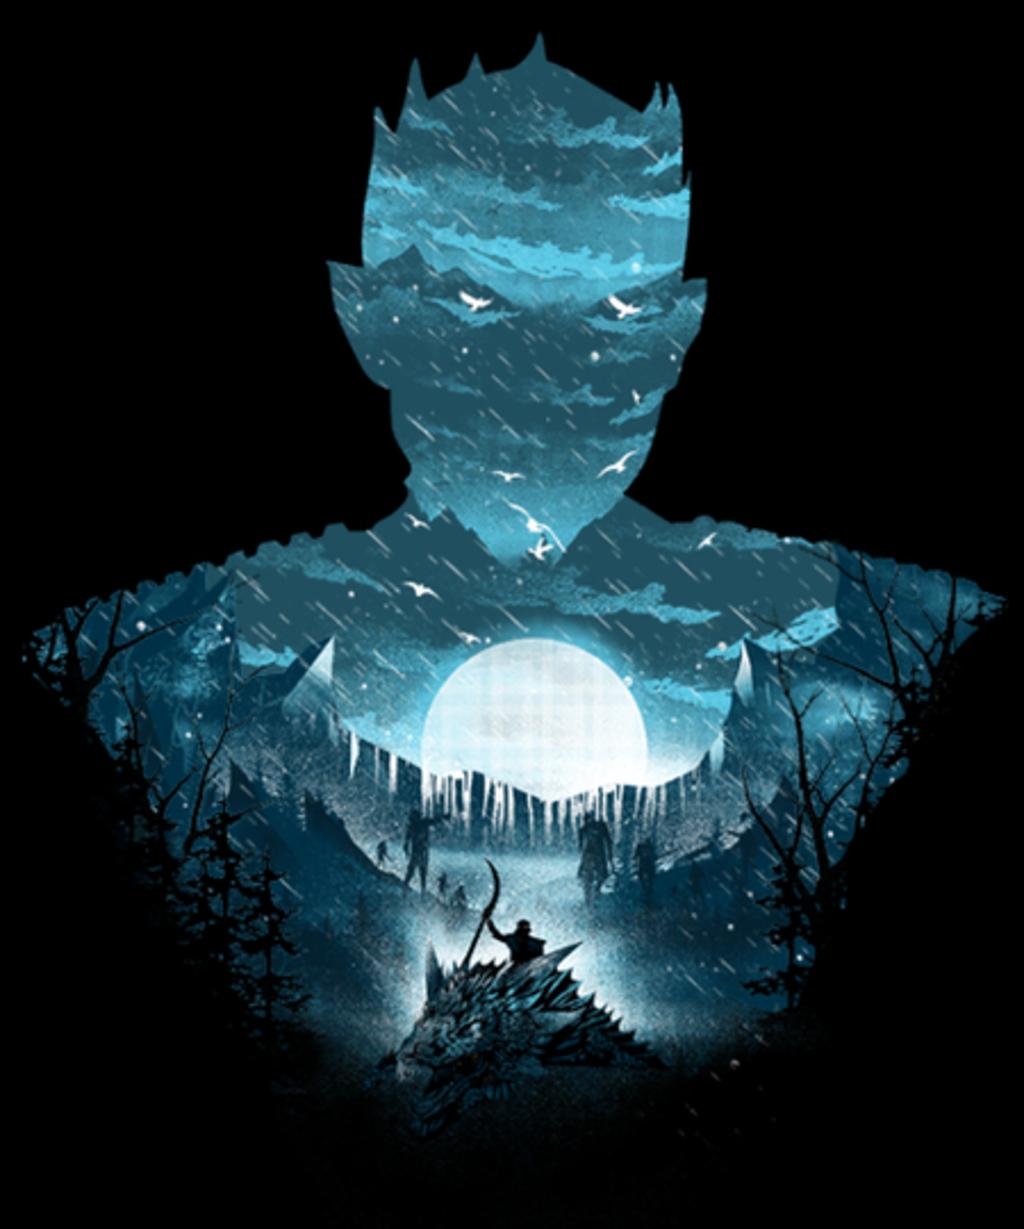 Qwertee: The Night King